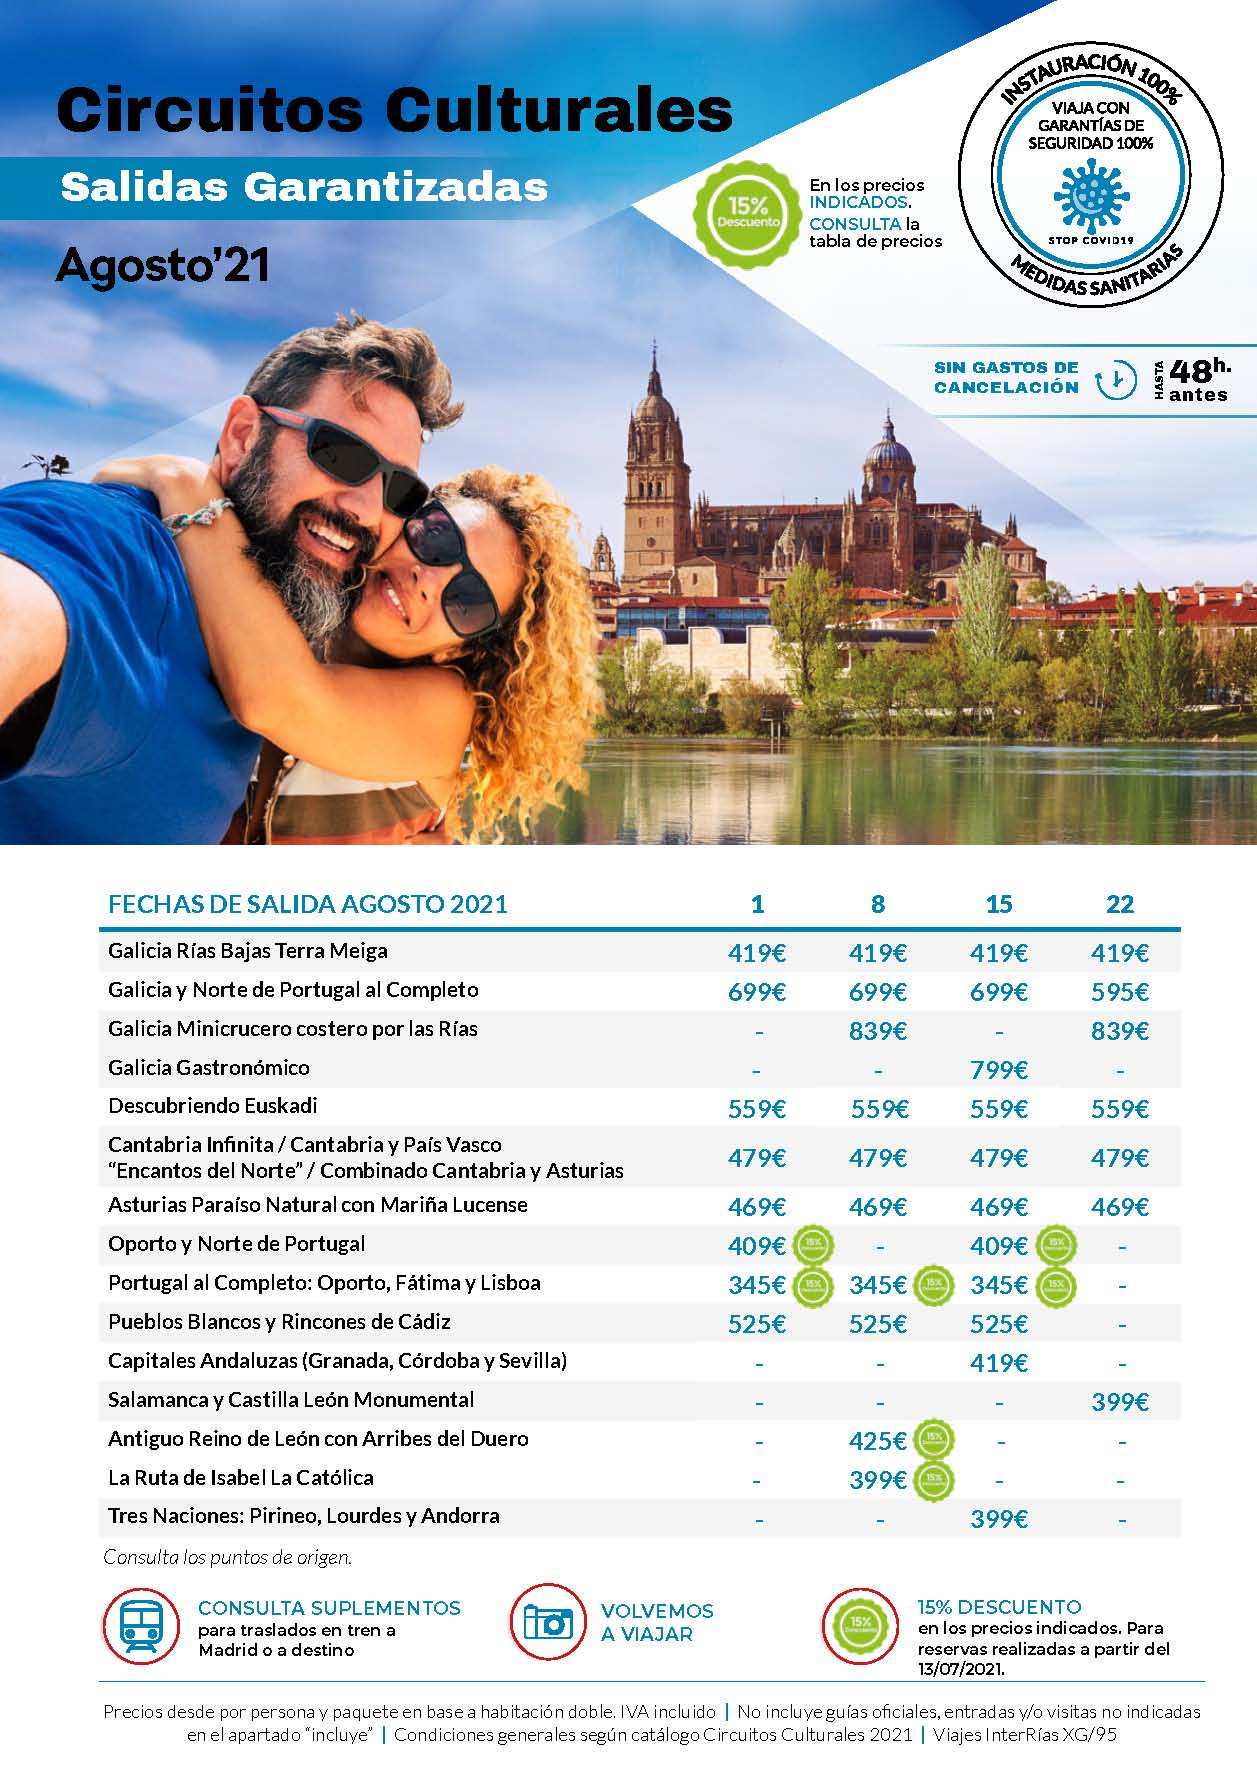 Oferta Interrias Circuitos Culturales Salidas Garantizadas Agosto 2021